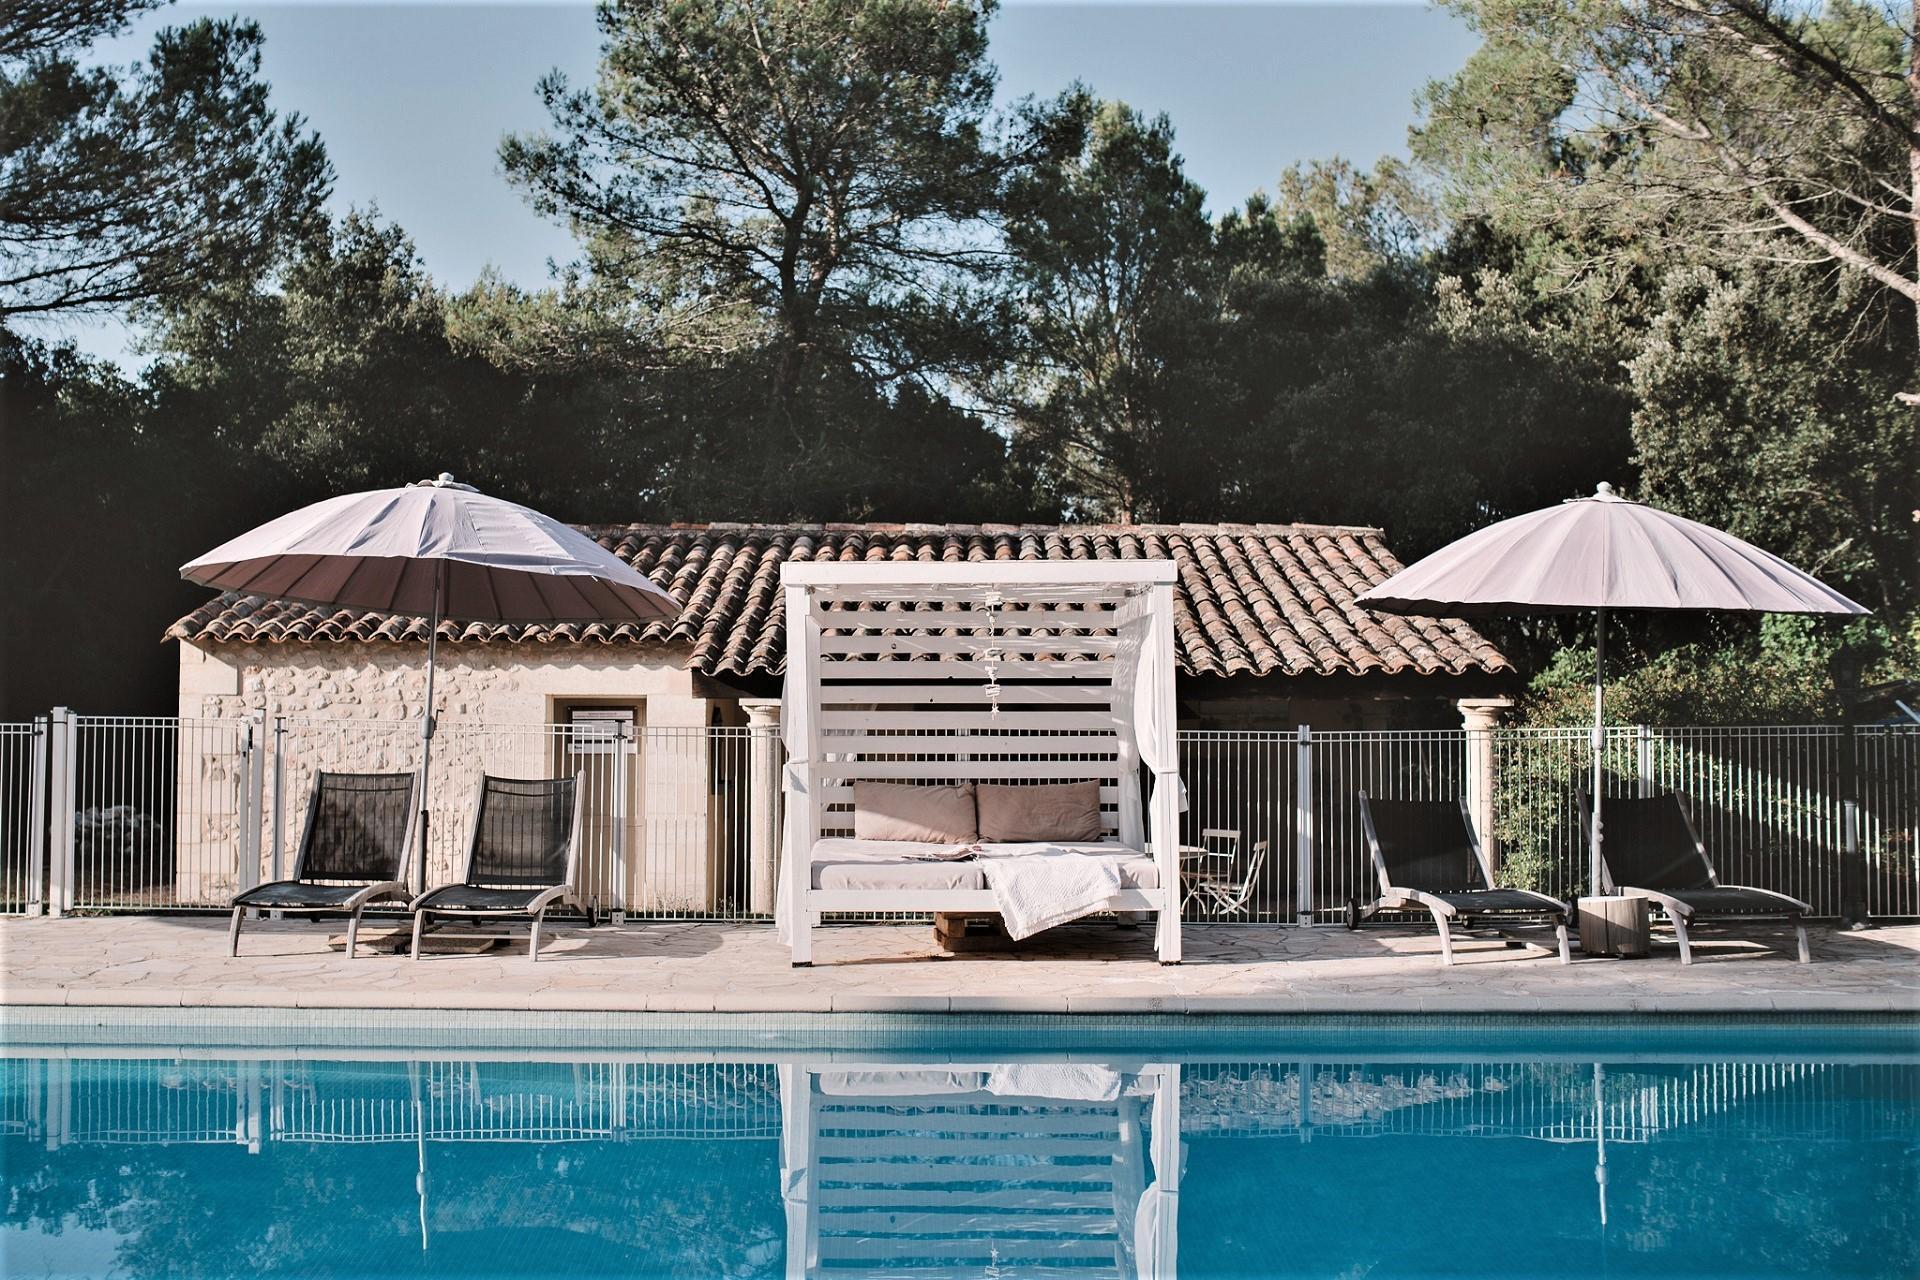 mas-de-rey-uzes-gard-provence-occitanie-piscine-seminaires-de-caractere